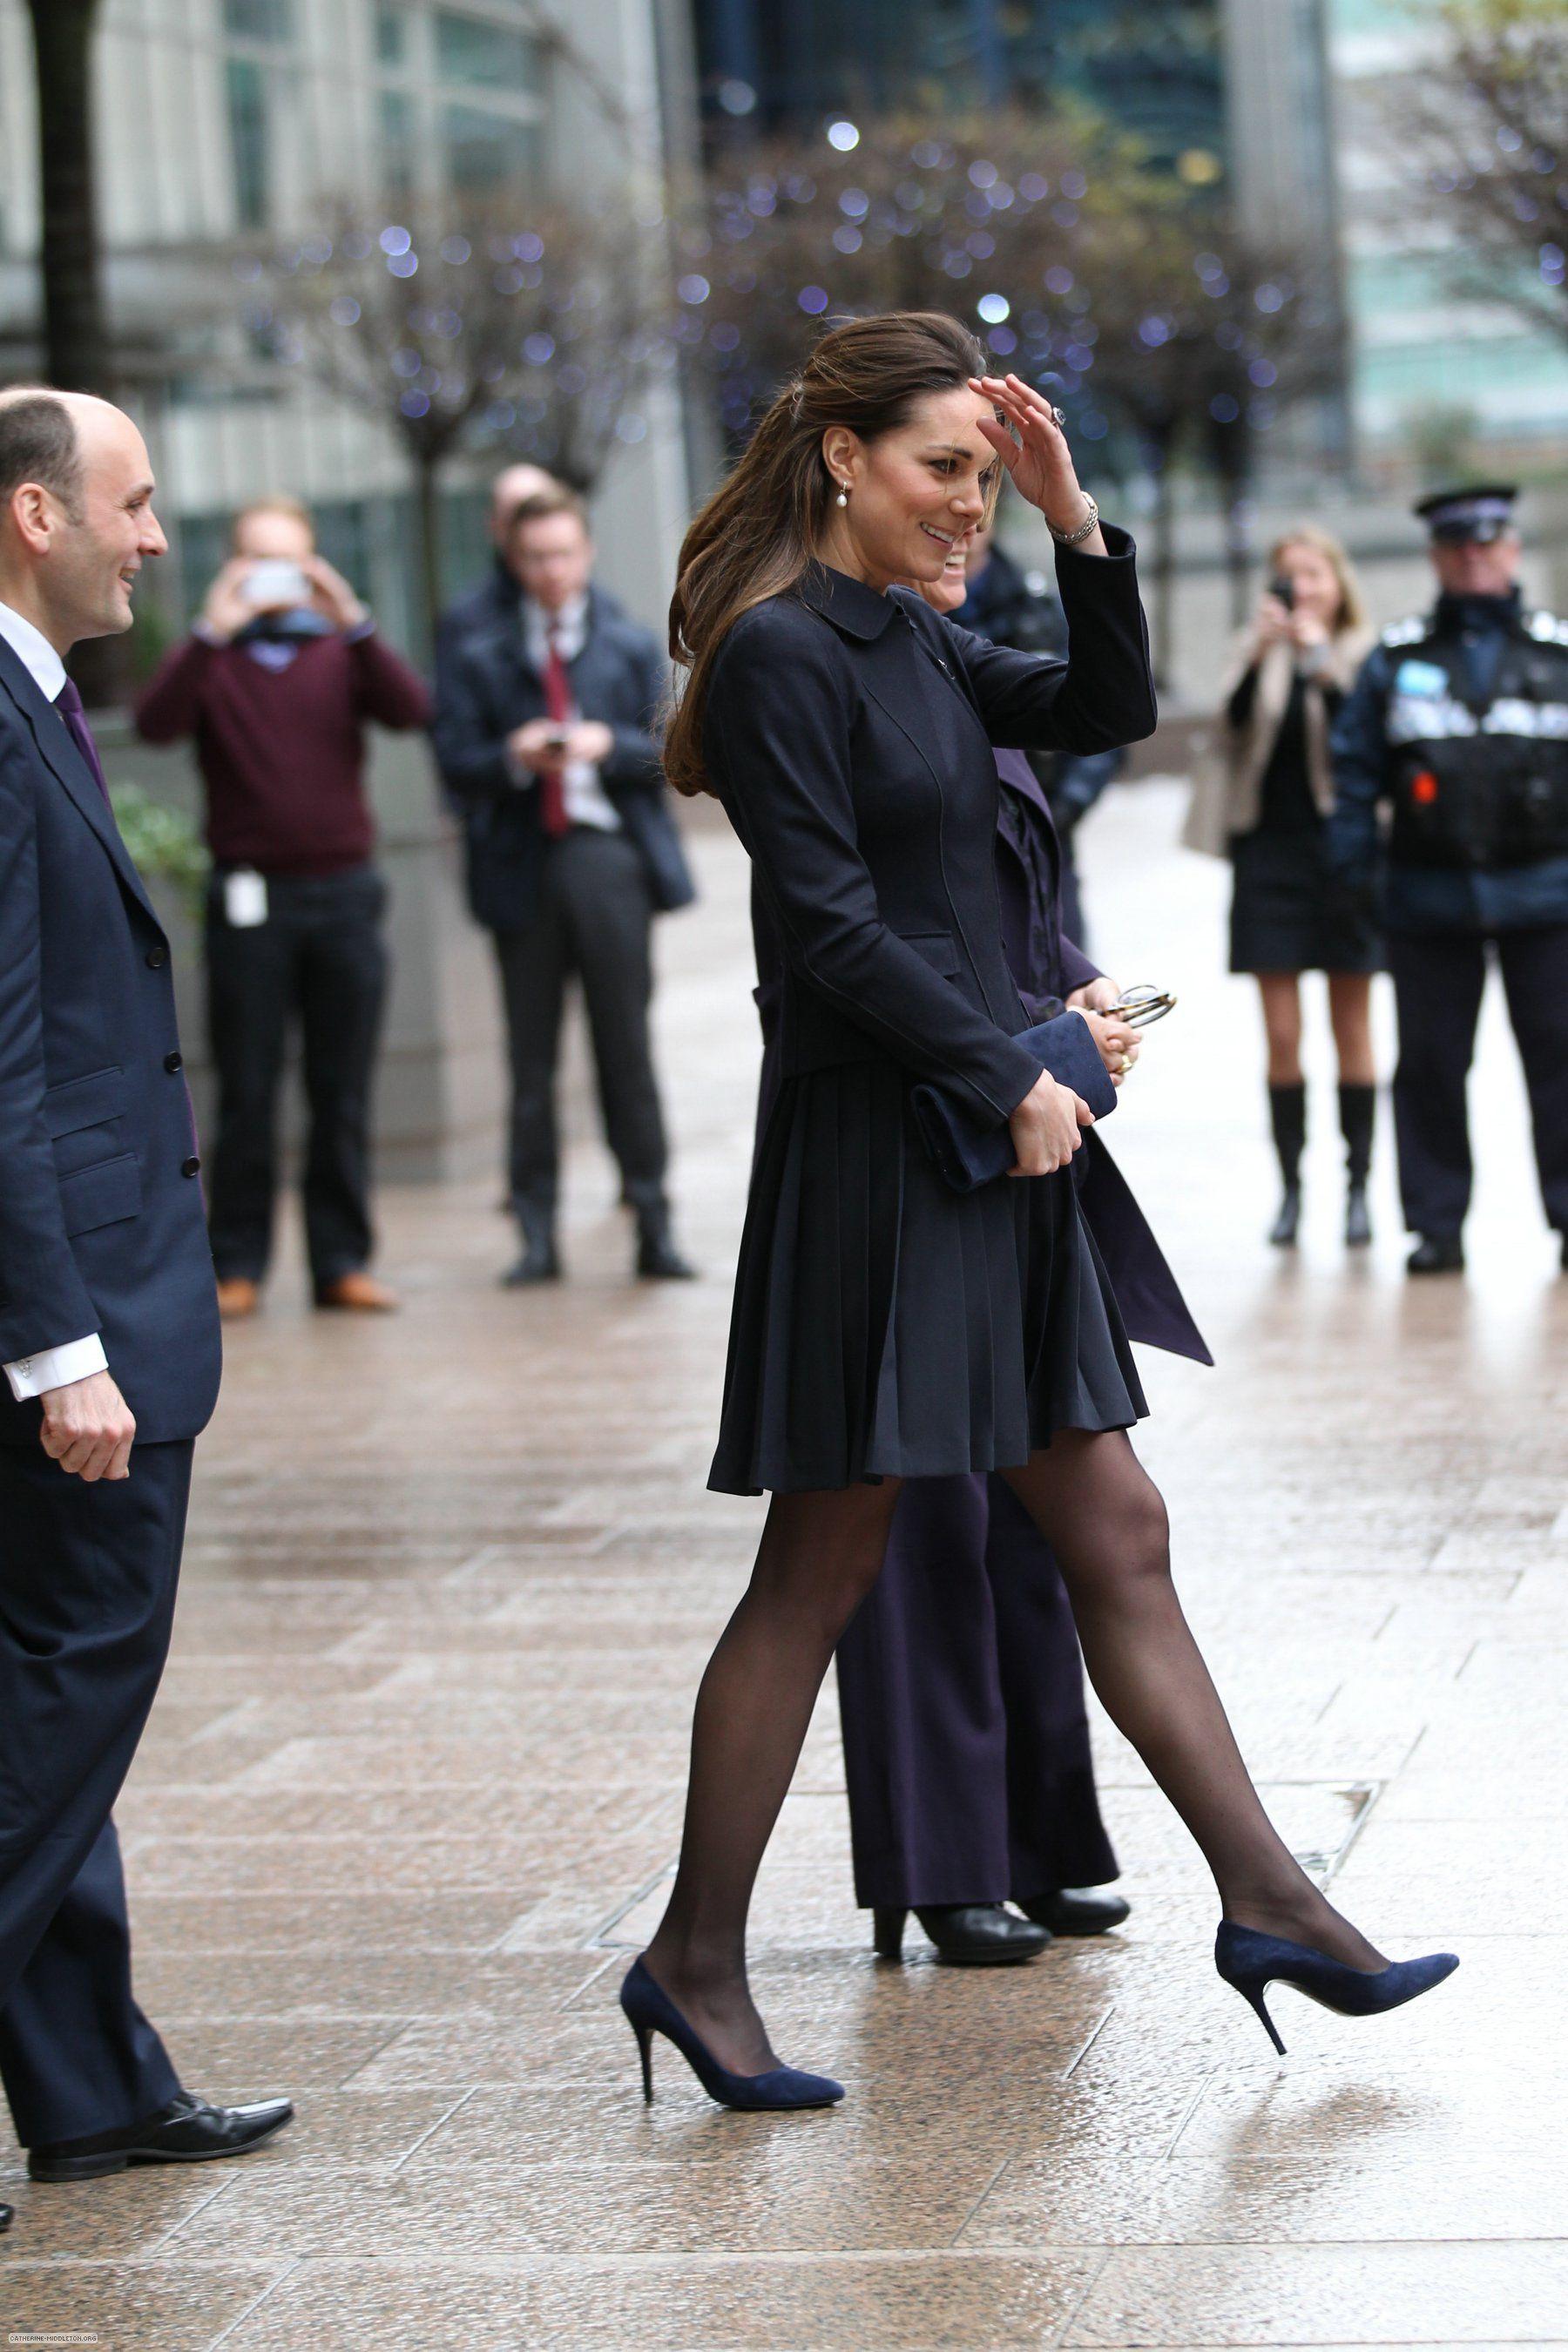 Pin Windwaker . Kate' Windy Clothes - London 2013